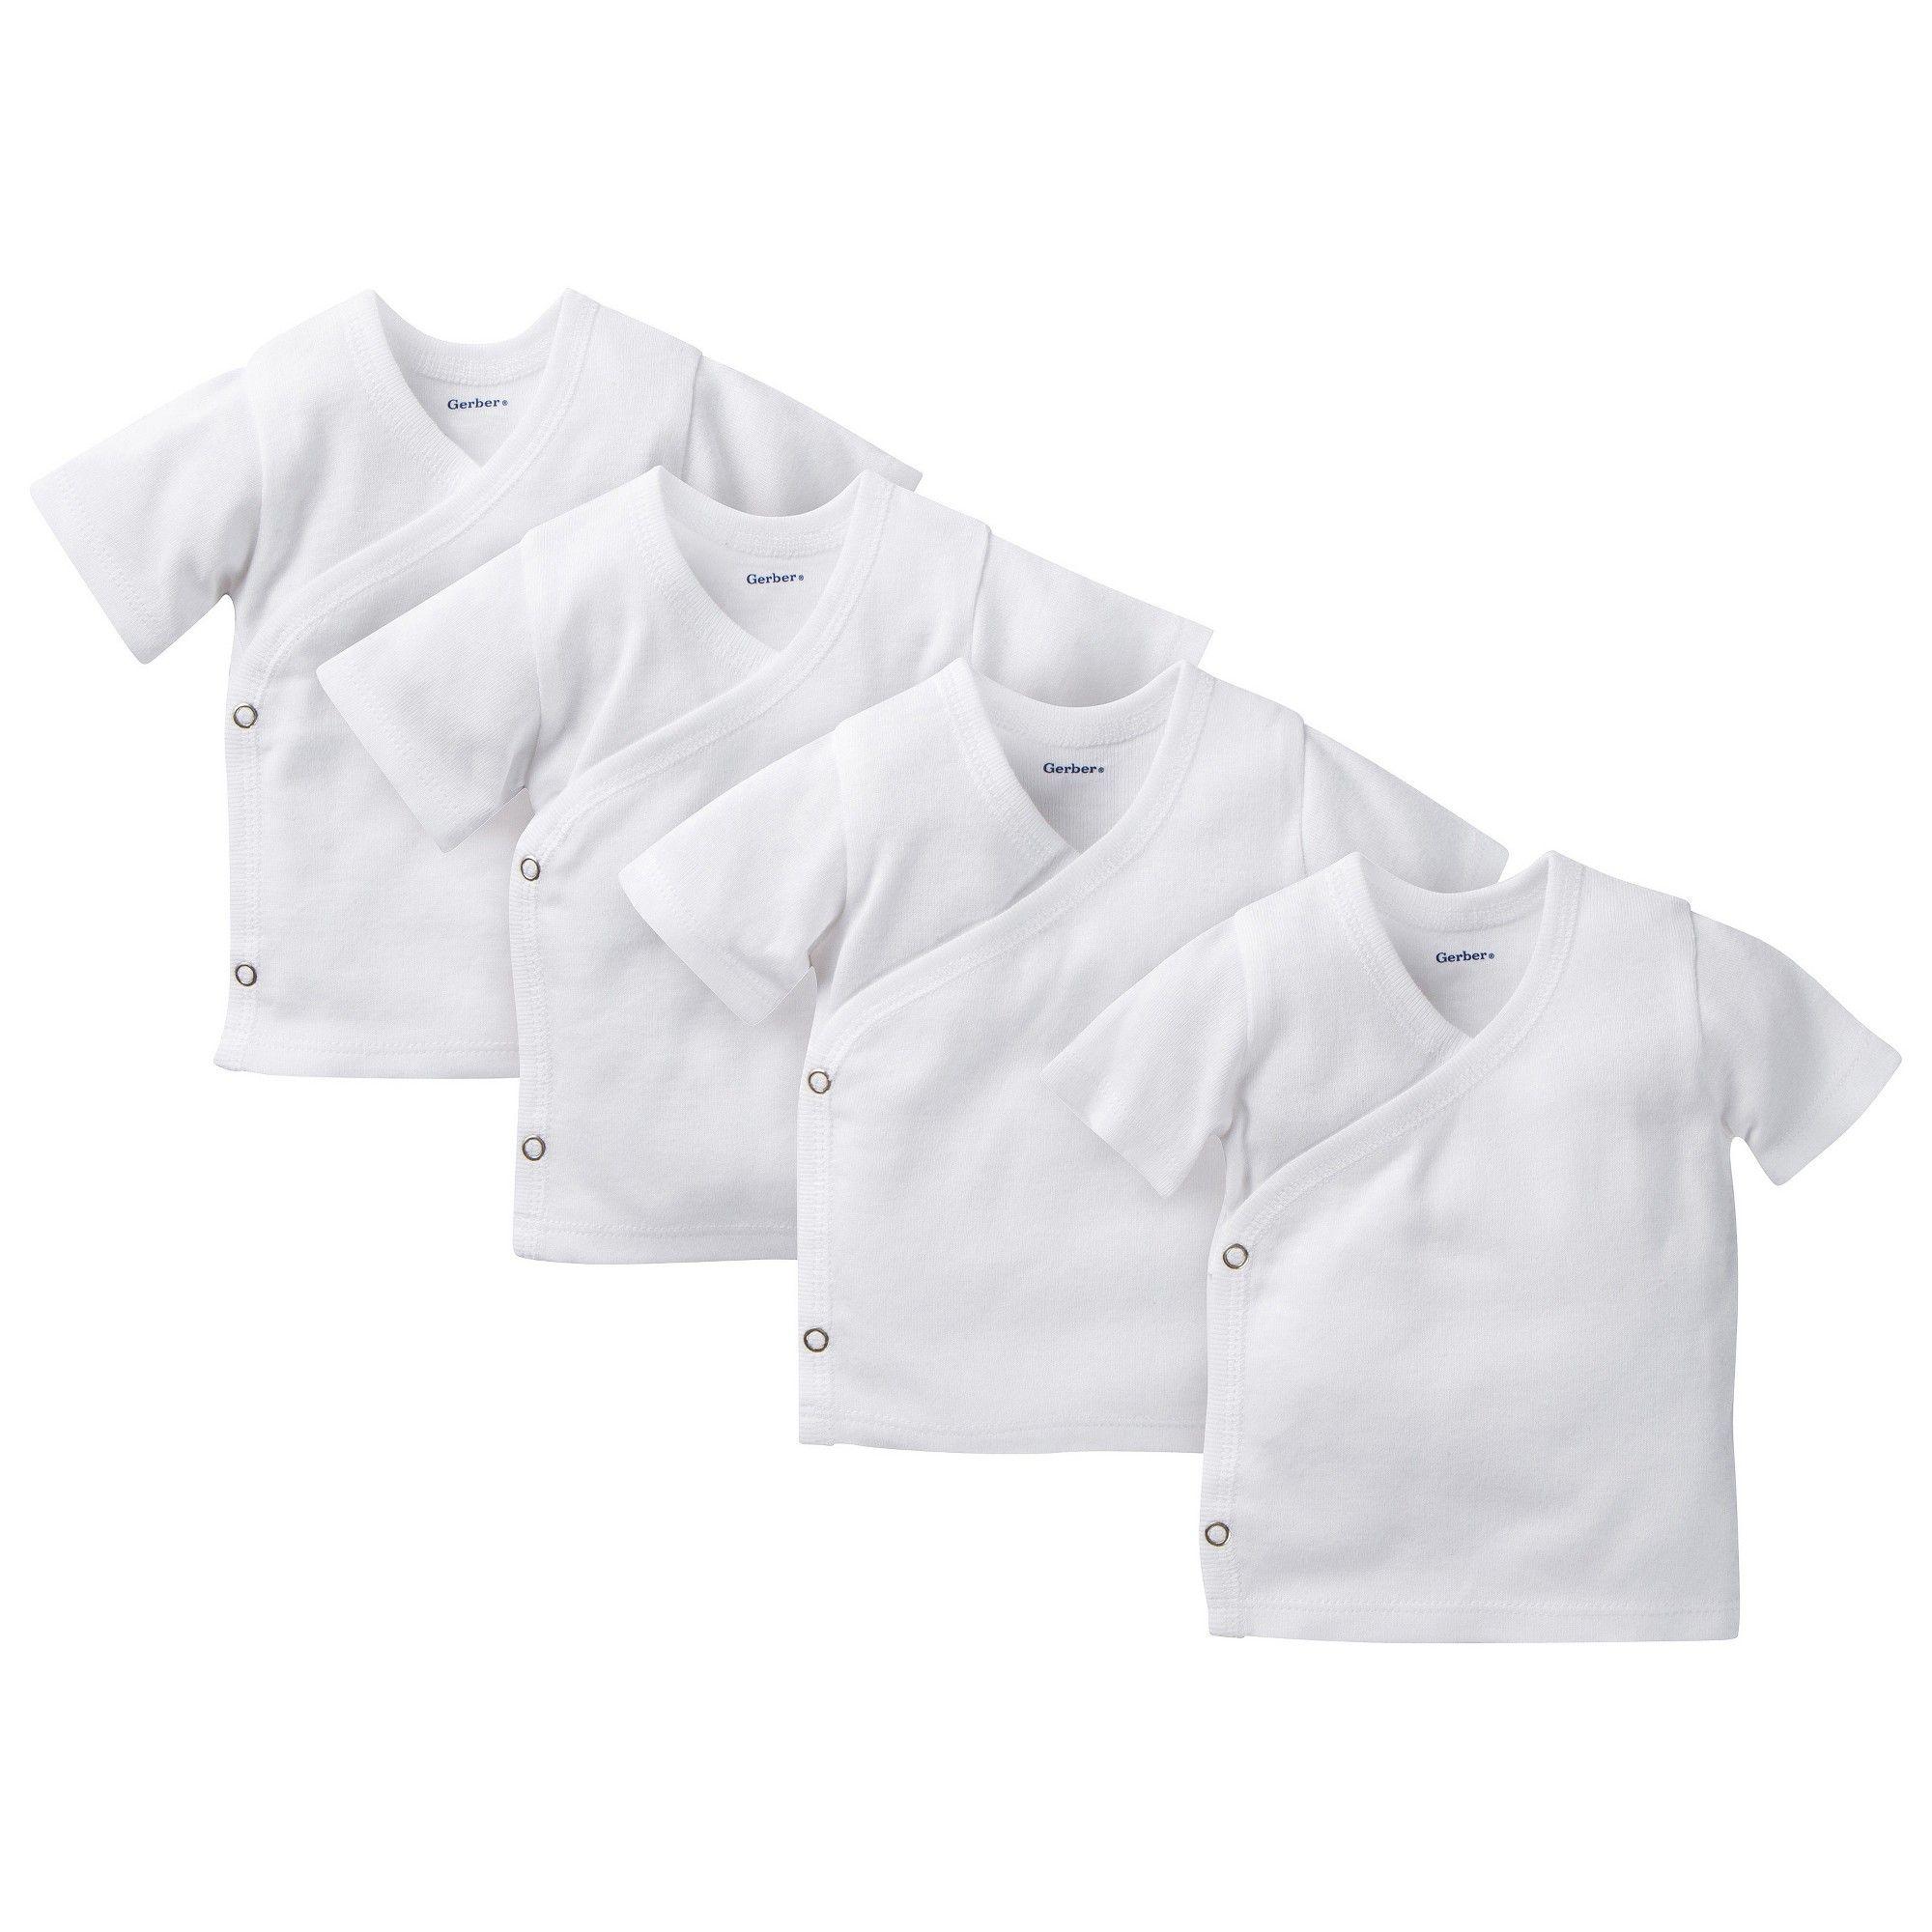 06dd82b48 Gerber Baby 4 Pack Short Sleeve Side Snap Shirts - White 0-3 M, Infant  Unisex